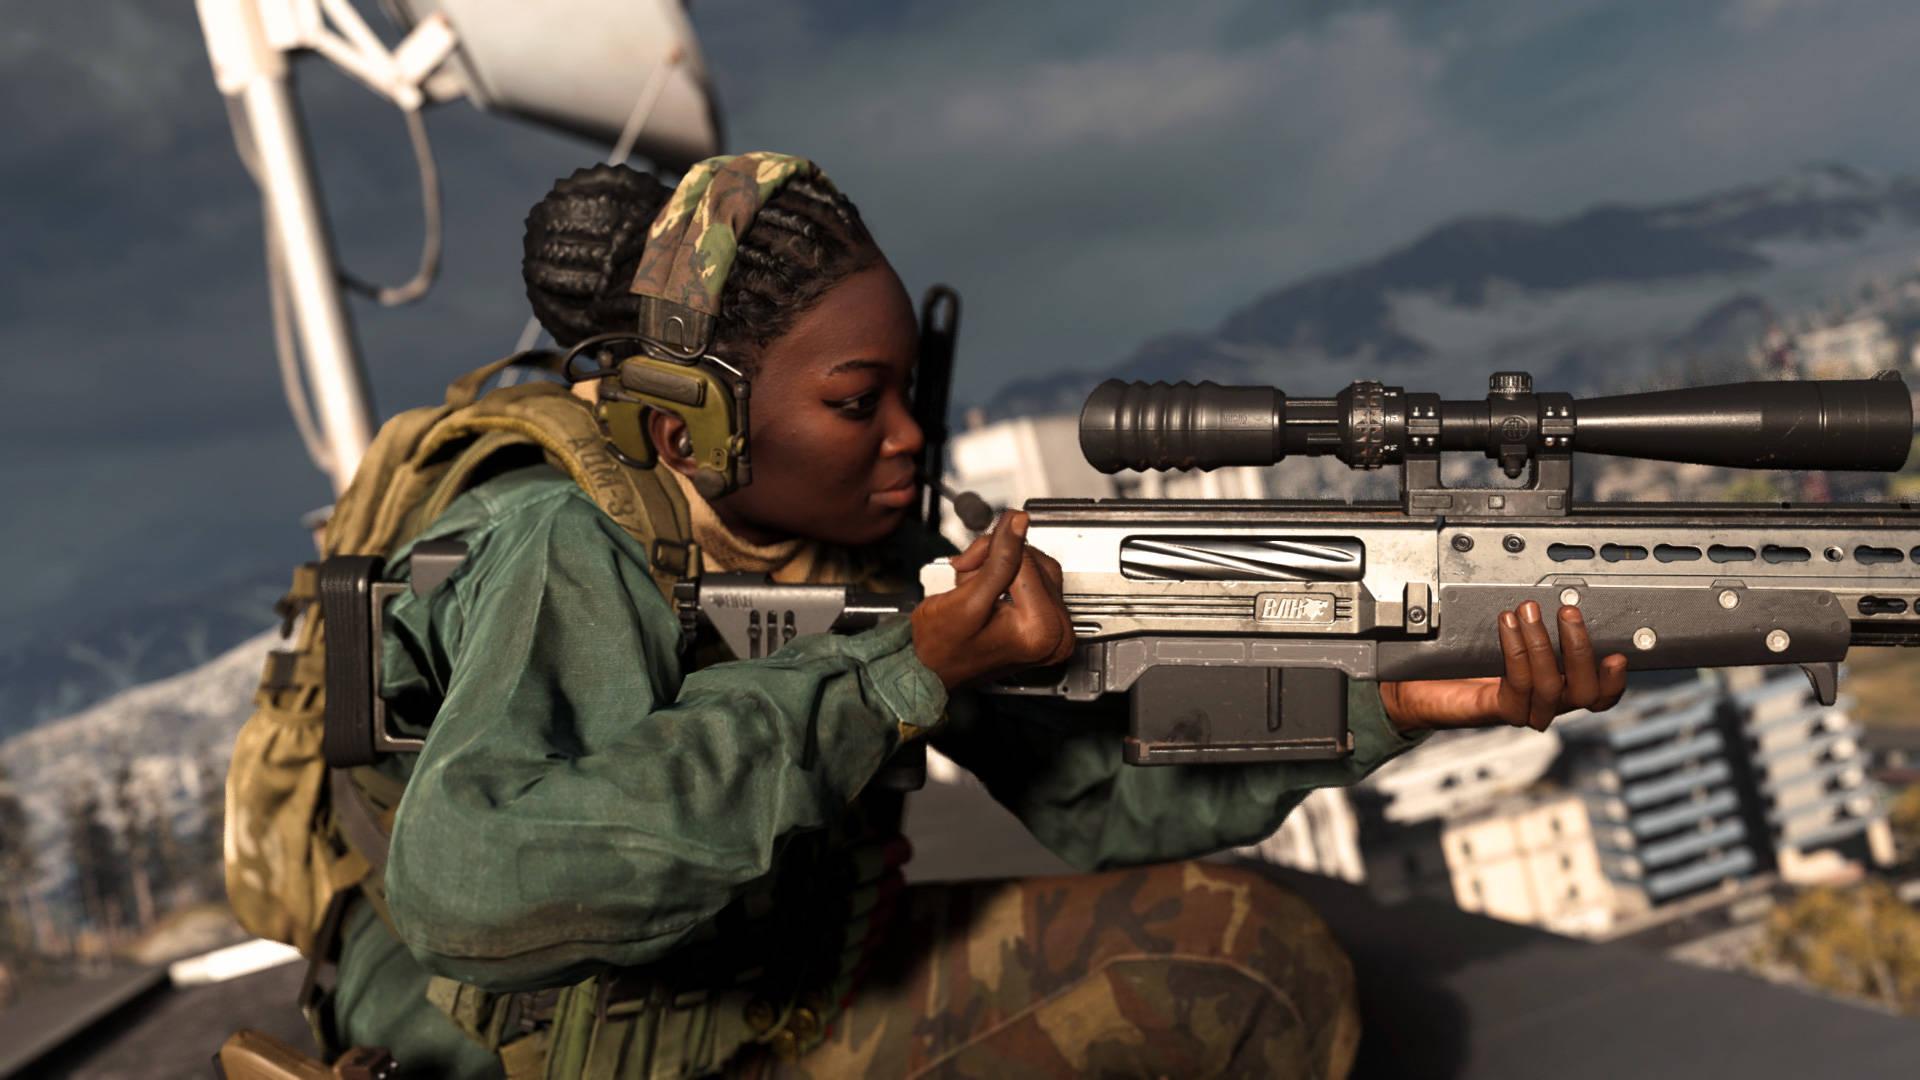 AX-50 - Le meilleur fusil de sniper de Warzone